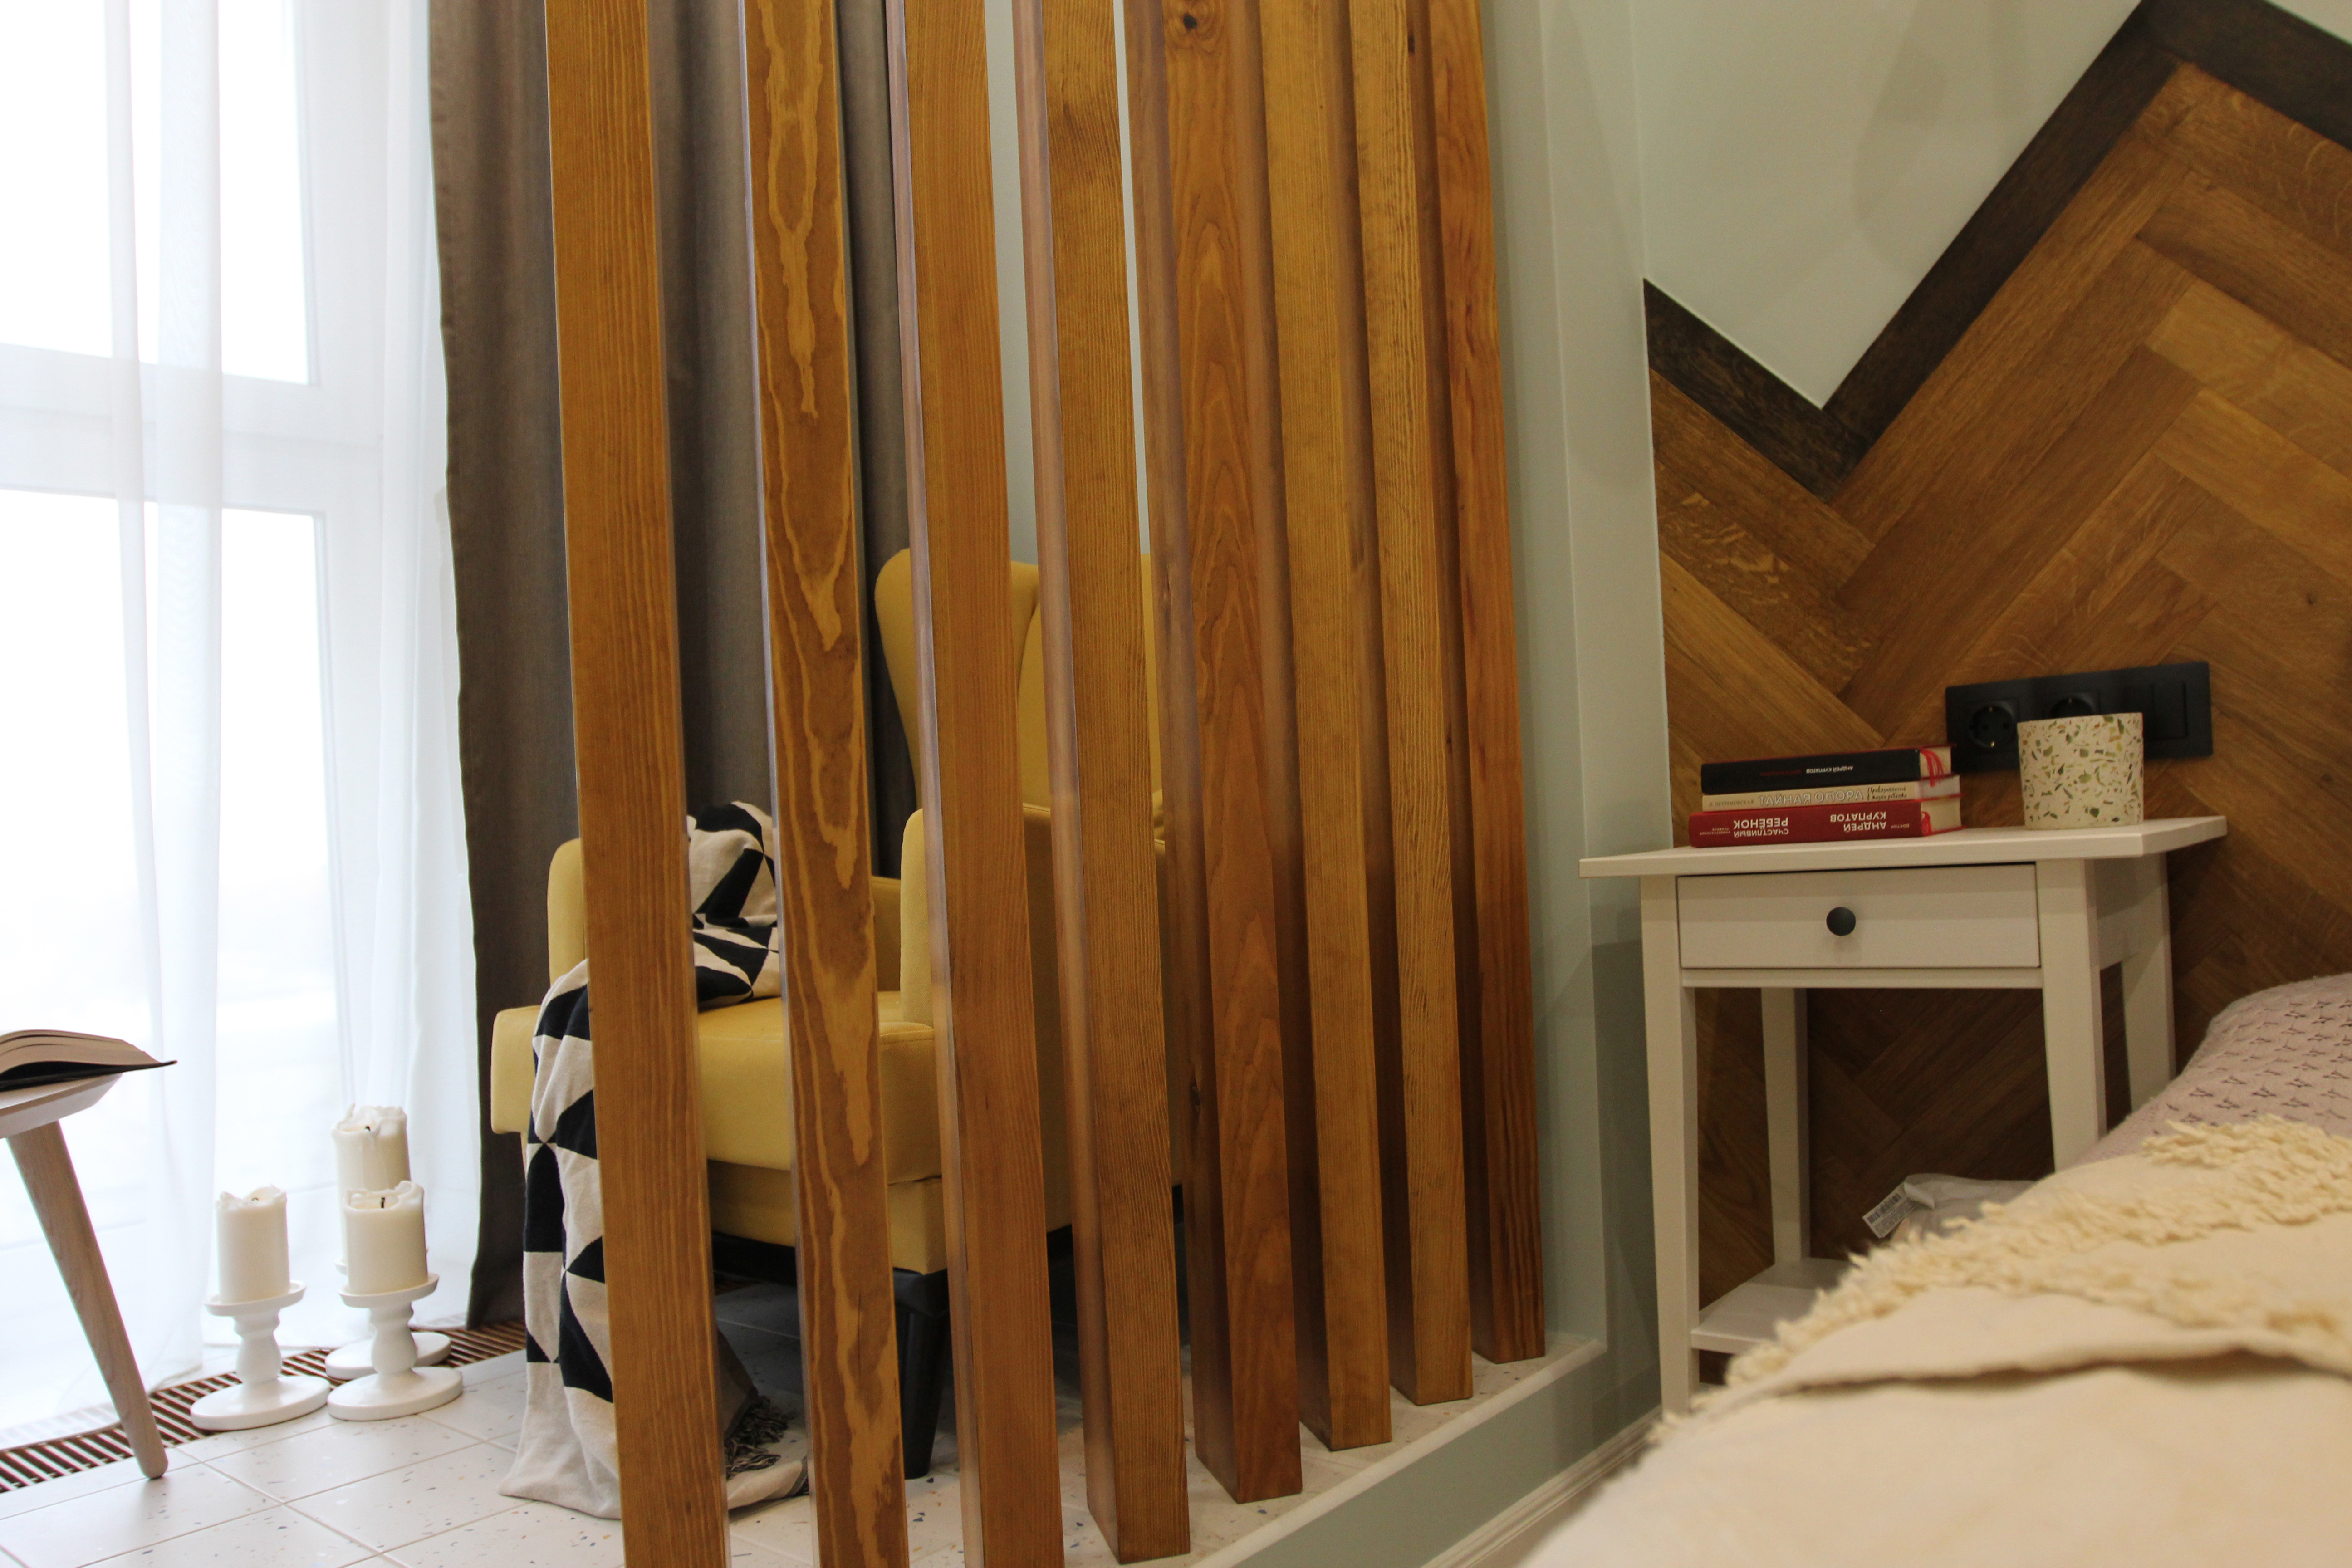 Реализация - Дизайн проект квартиры 45м2 в ЖК Люберецкий